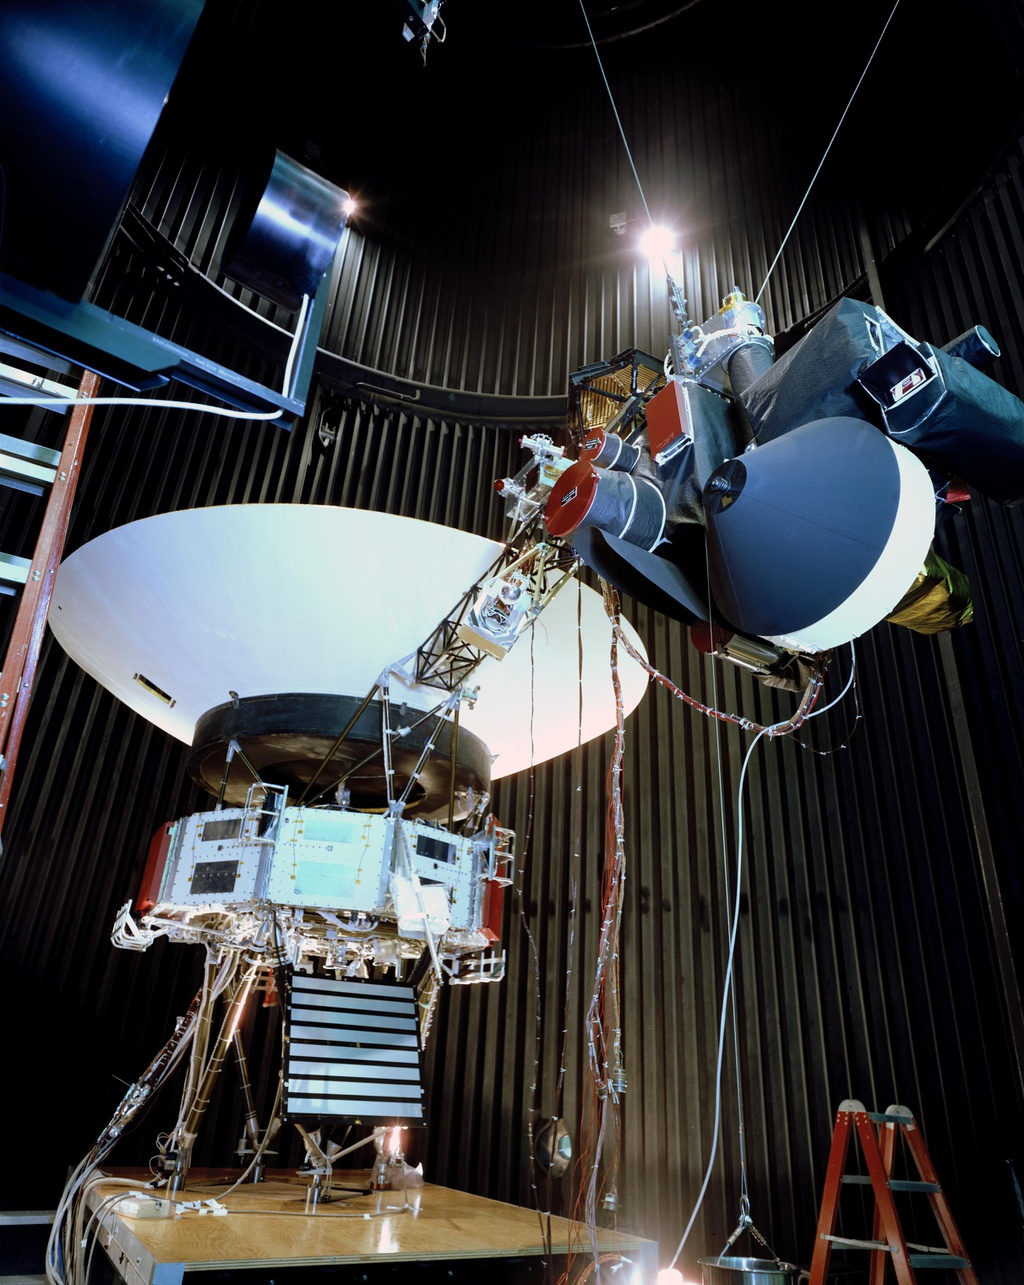 Tau vu tru Voyager 2 va hanh trinh 42 nam vuot thoat He Mat Troi hinh anh 2